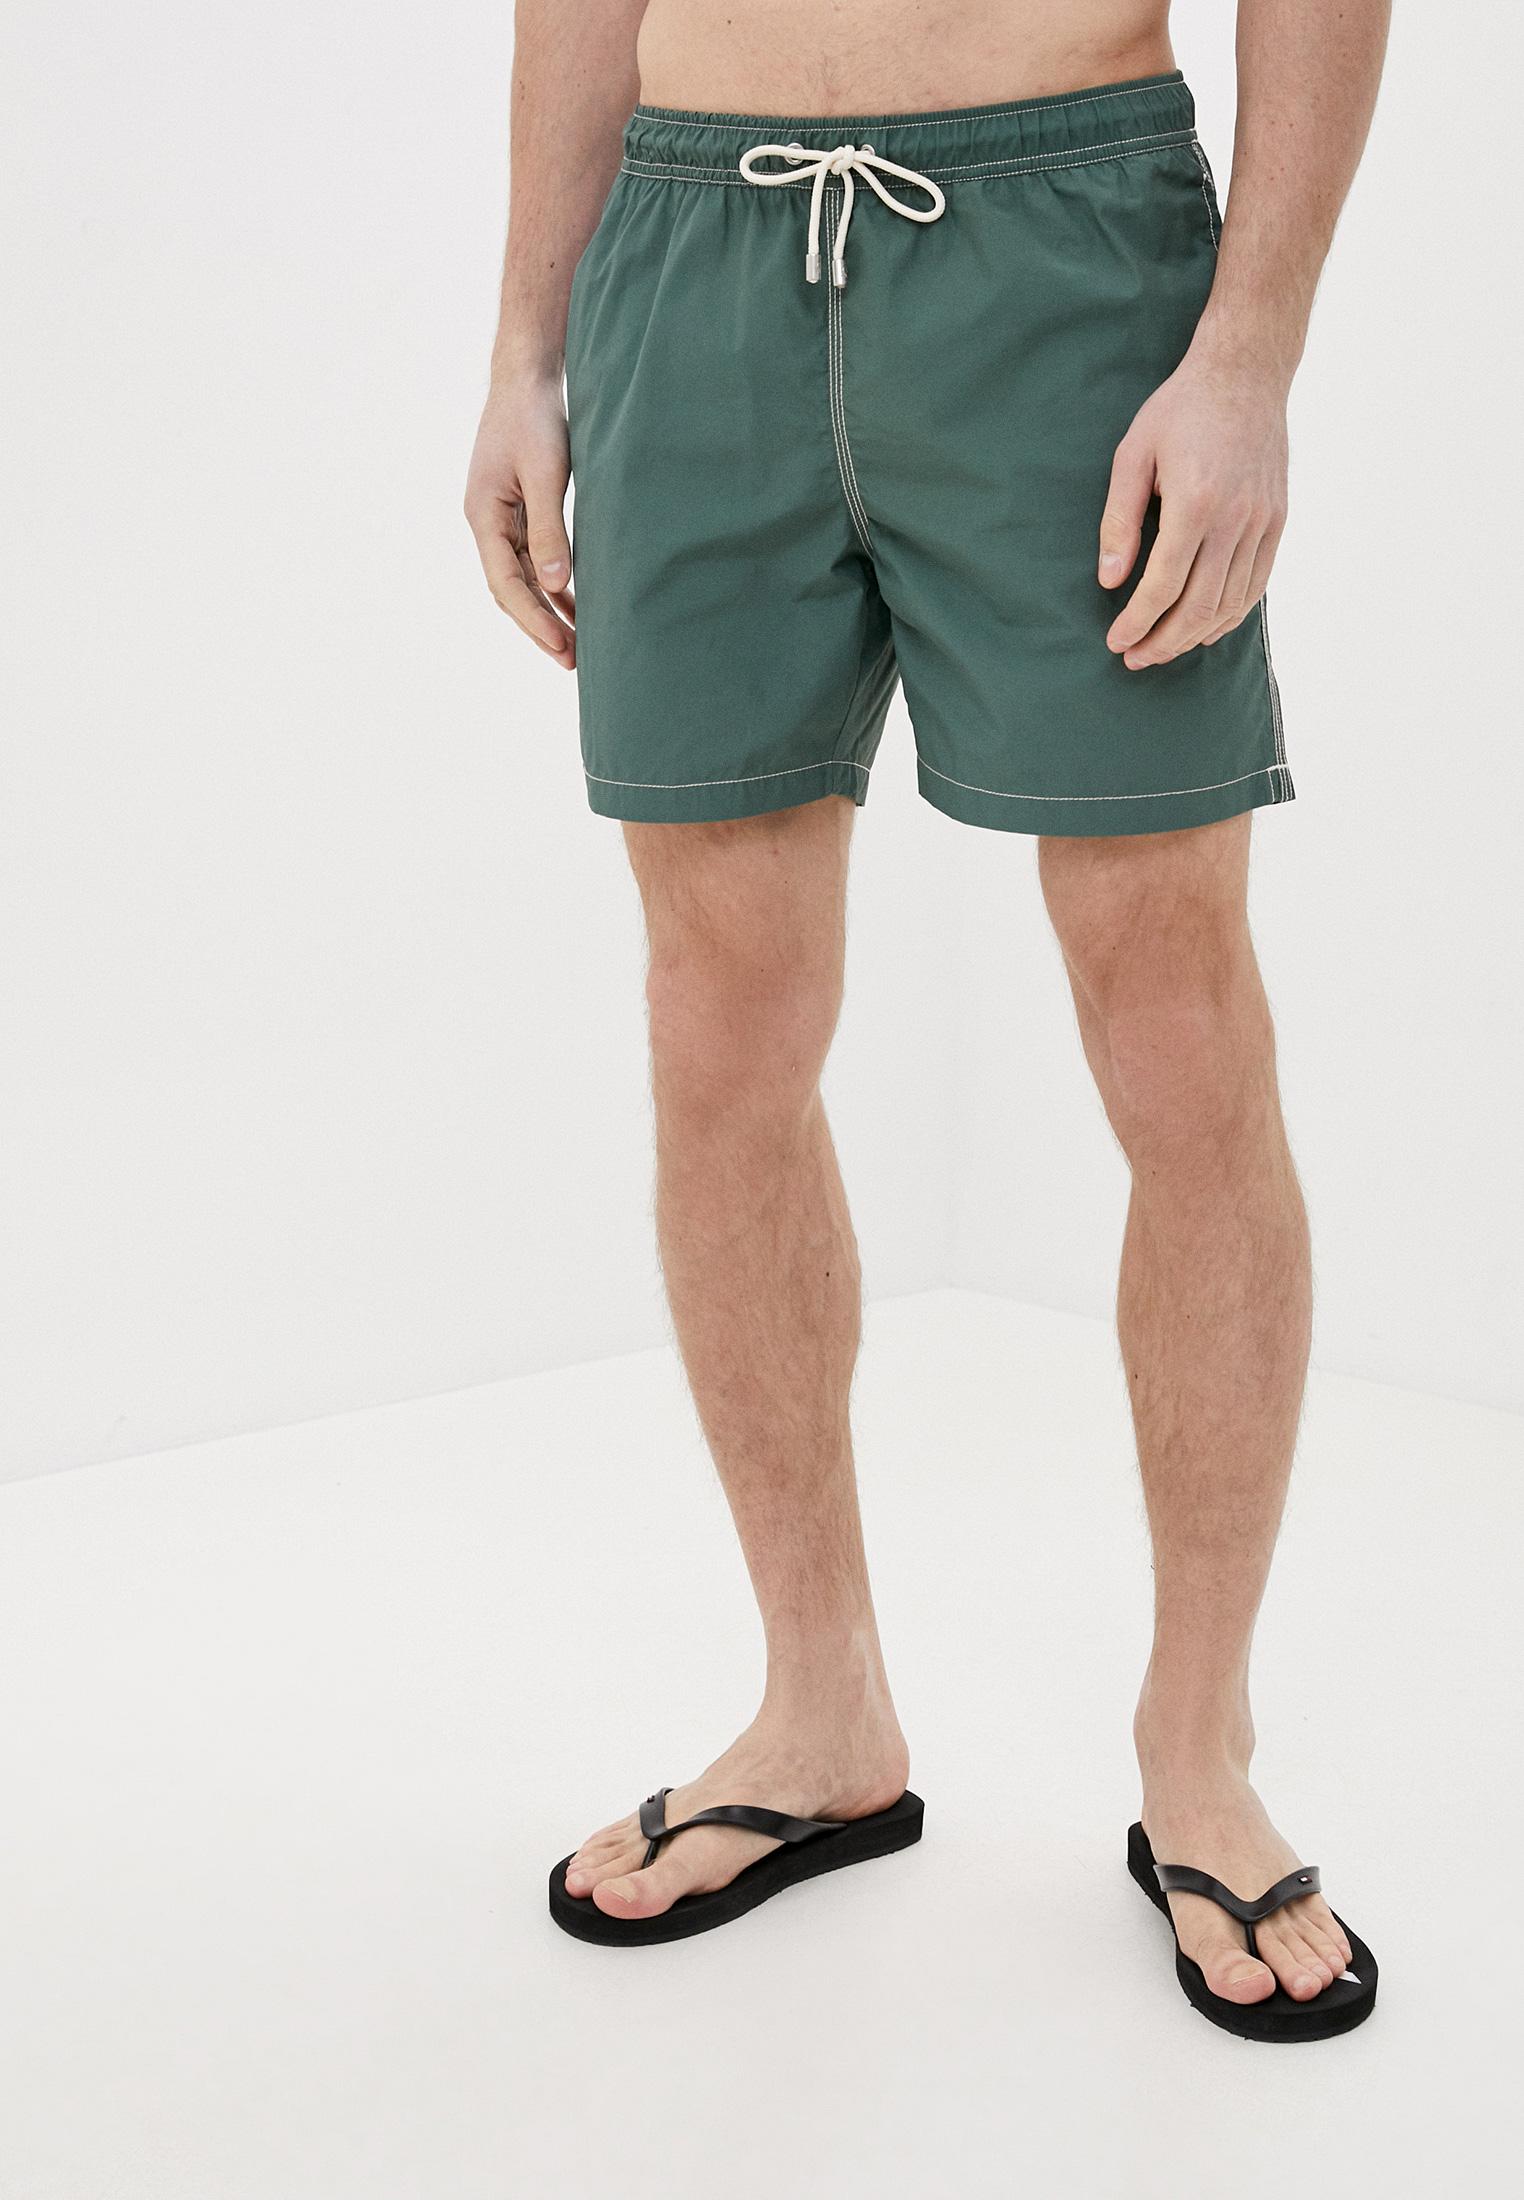 Мужские шорты для плавания United Colors of Benetton (Юнайтед Колорс оф Бенеттон) 5AKL6X149